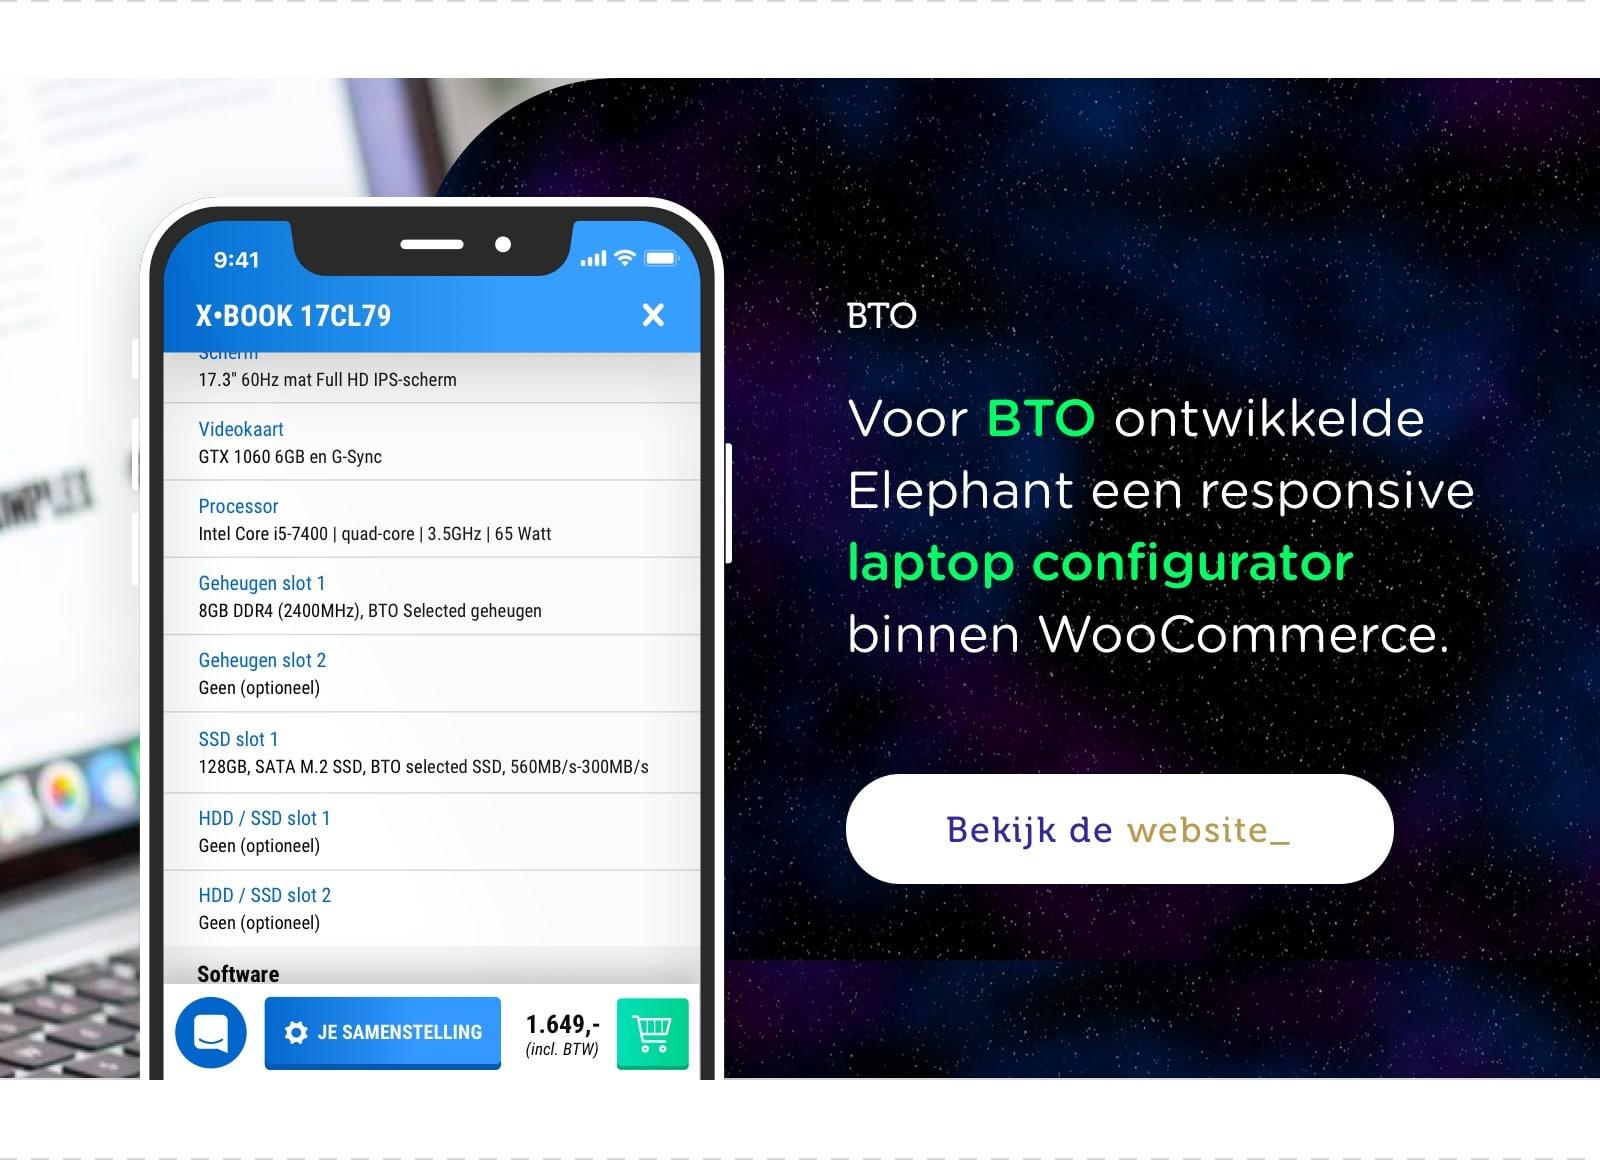 BTO laptop configurator